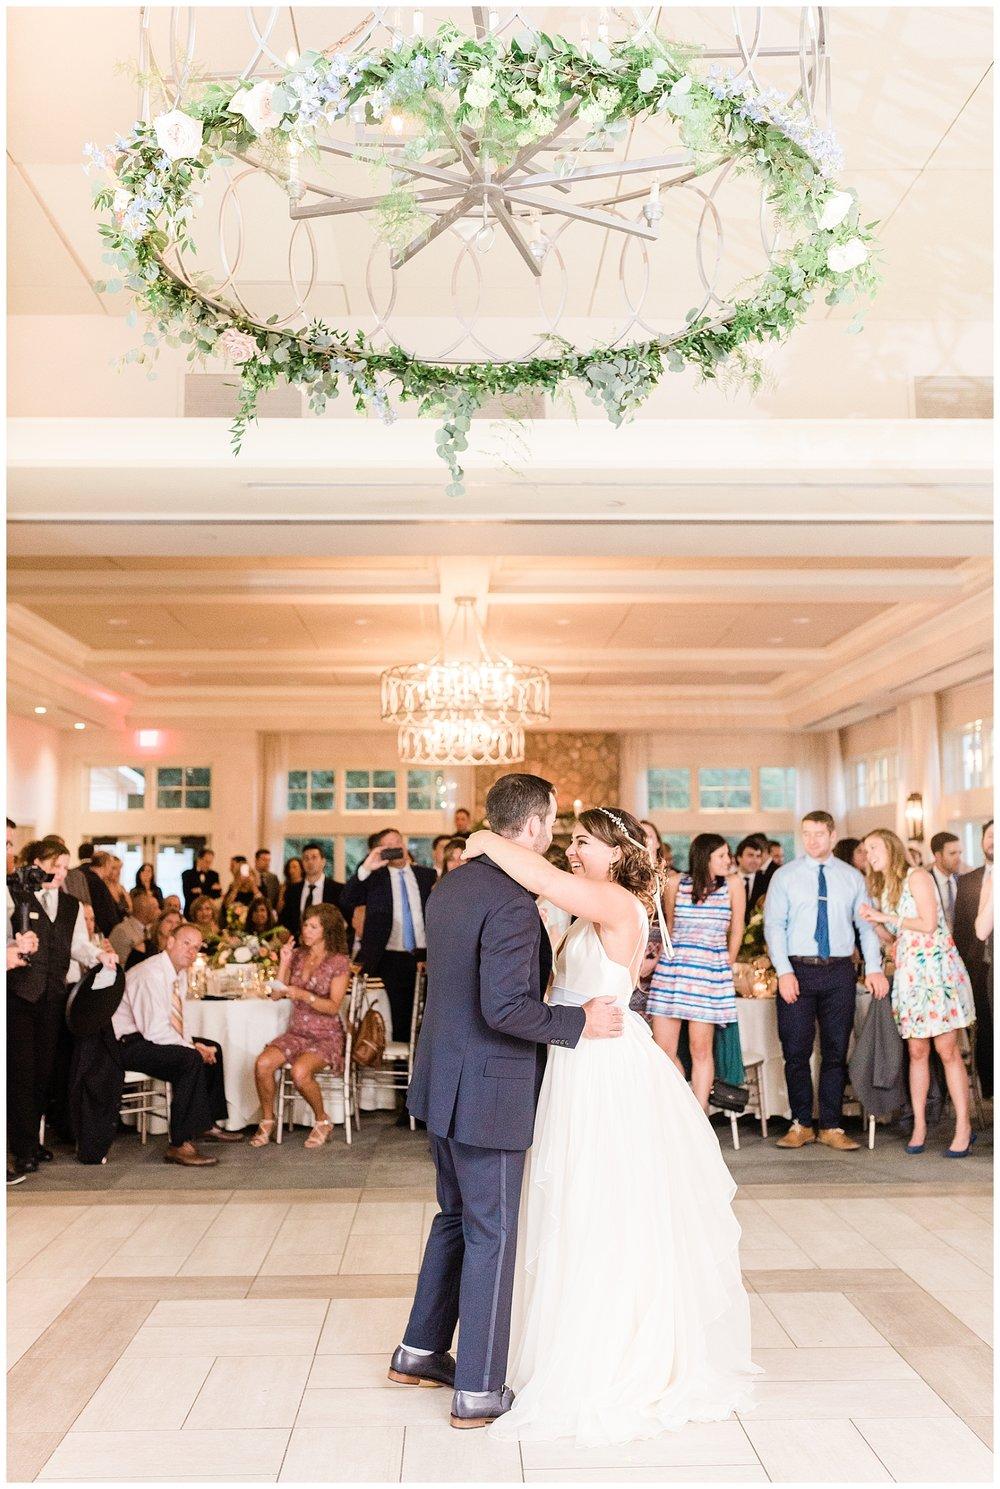 Indian-Trail-Club-Franklin-Lakes-NJ-Summer-Stylish-Wedding-Photographer-Photo-_0201.jpg